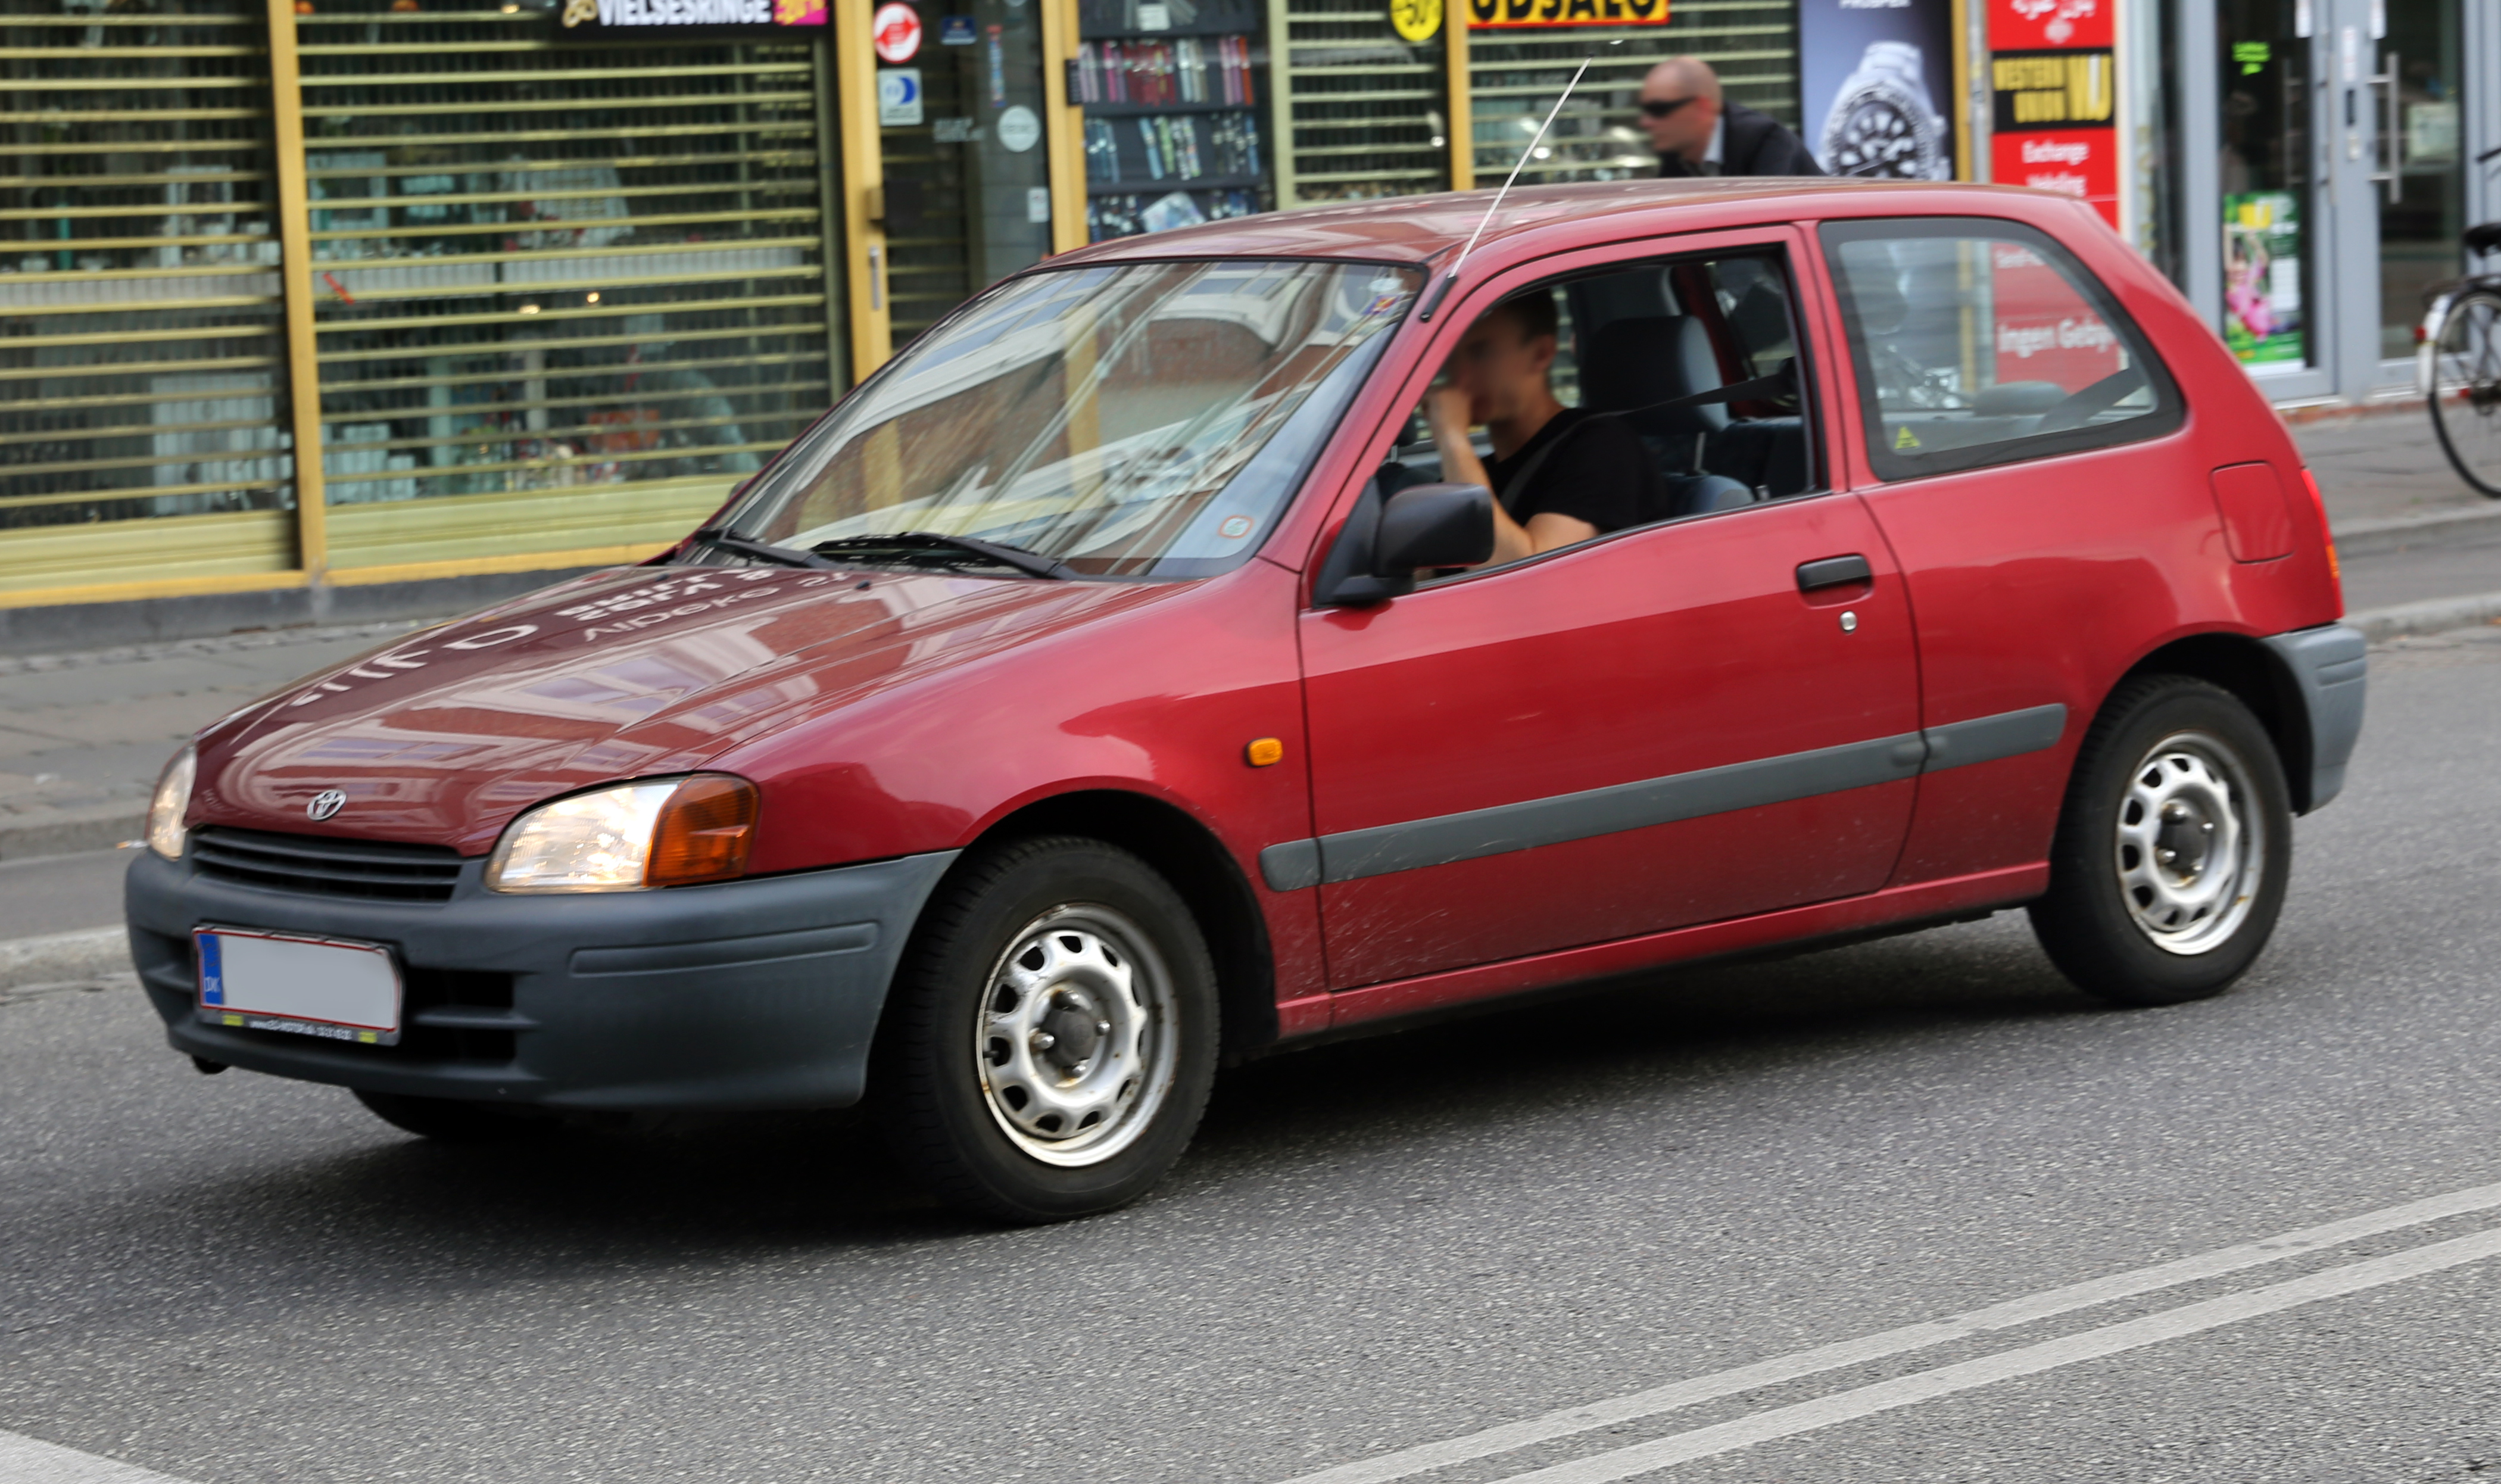 Kekurangan Toyota Starlet 1999 Harga